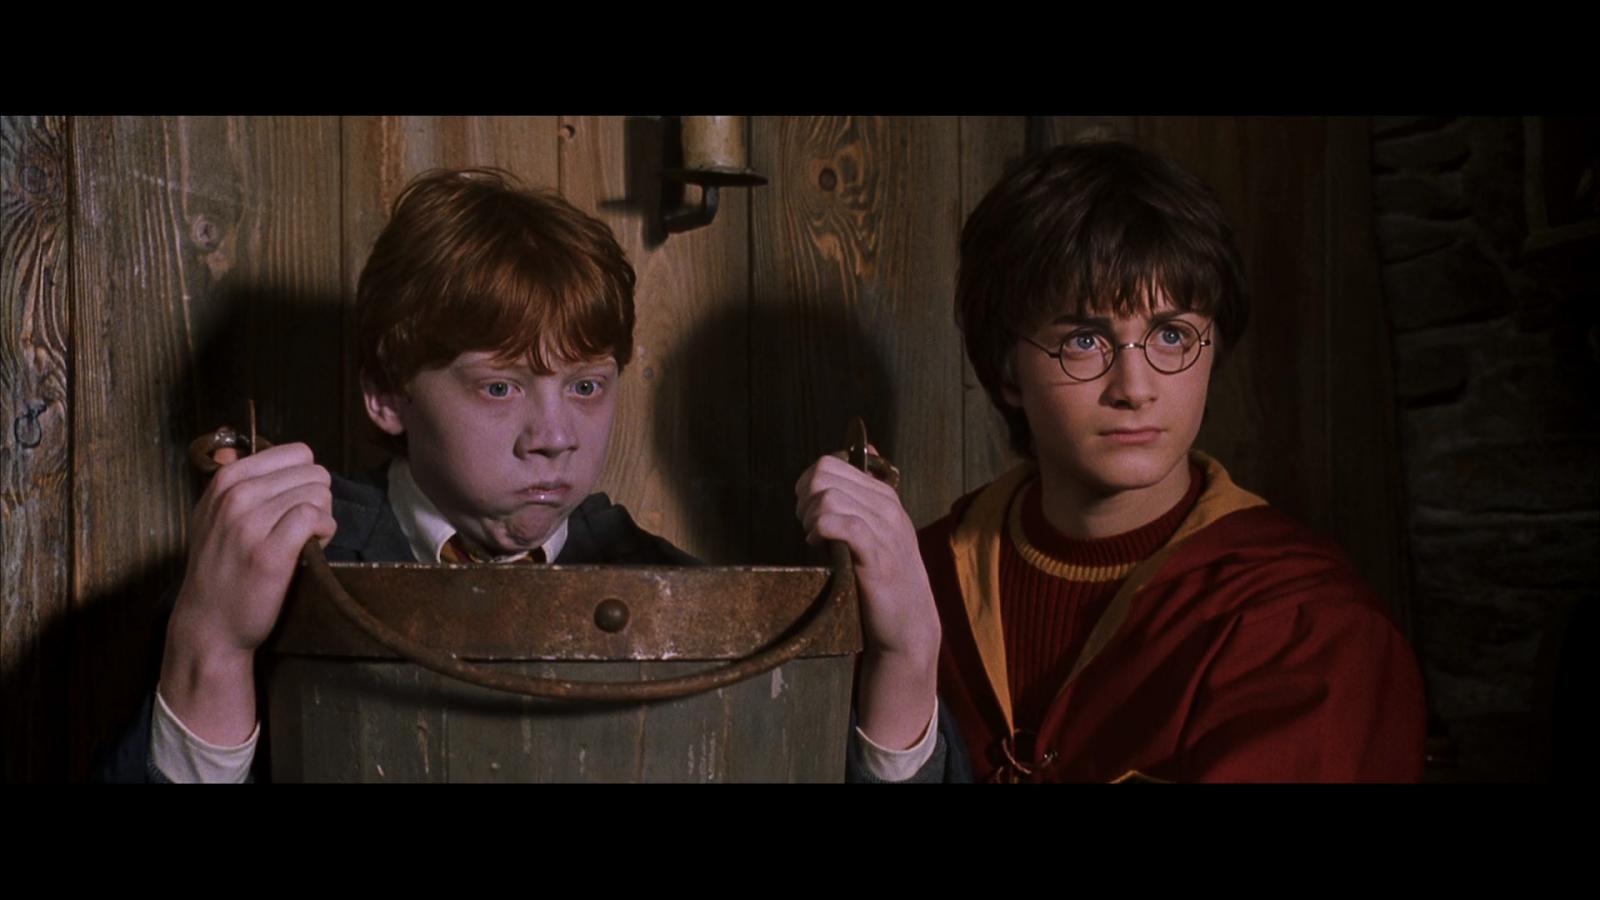 Harry Potter y la cámara secreta (2002) BRRip 720p Latino-Castellano-Ingles captura 1